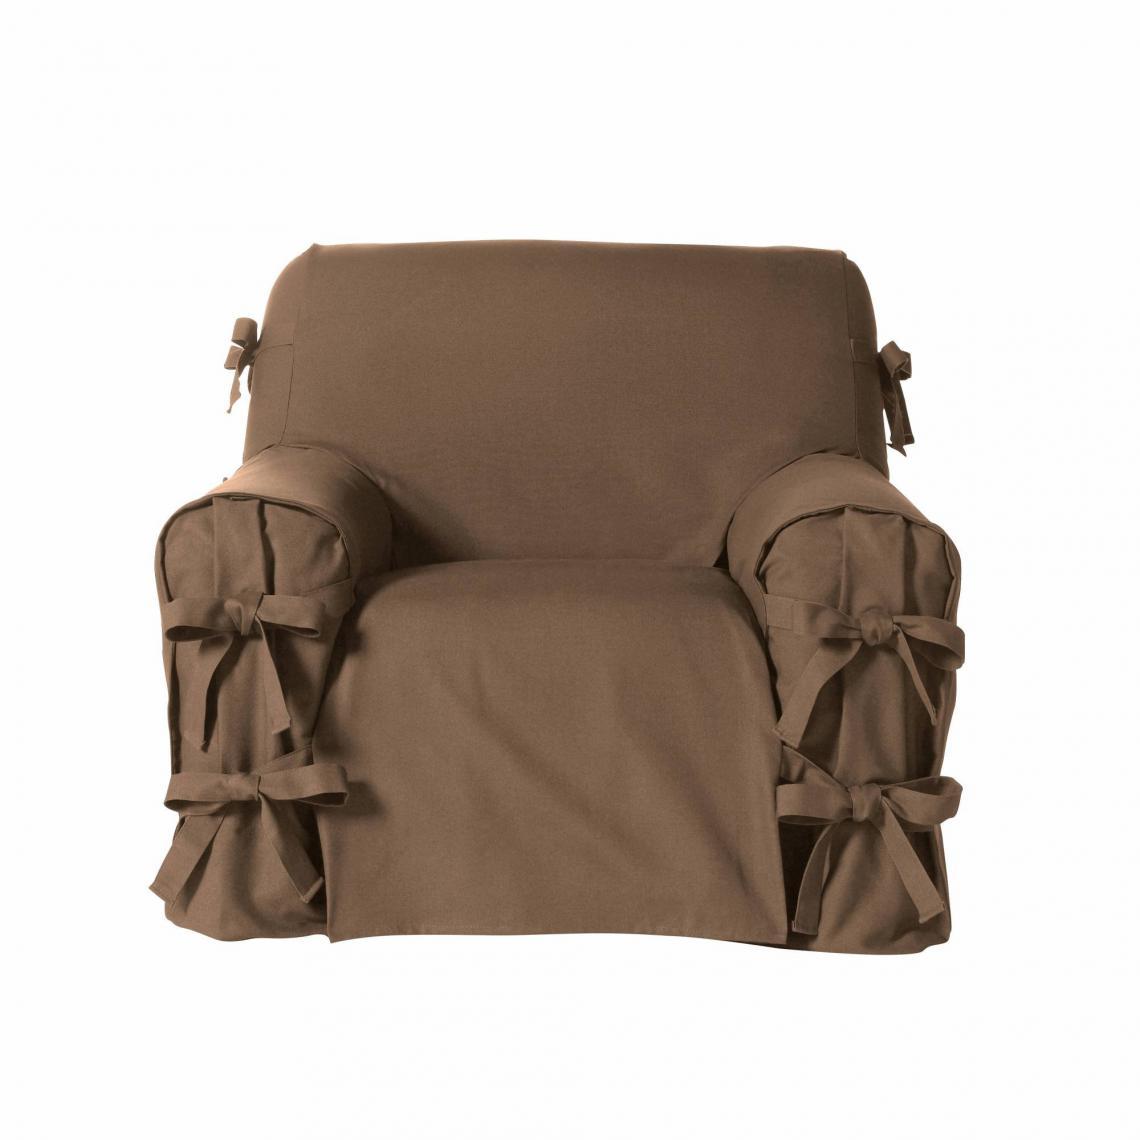 housse fauteuil canape avec accoudoirs a nouettes taupe